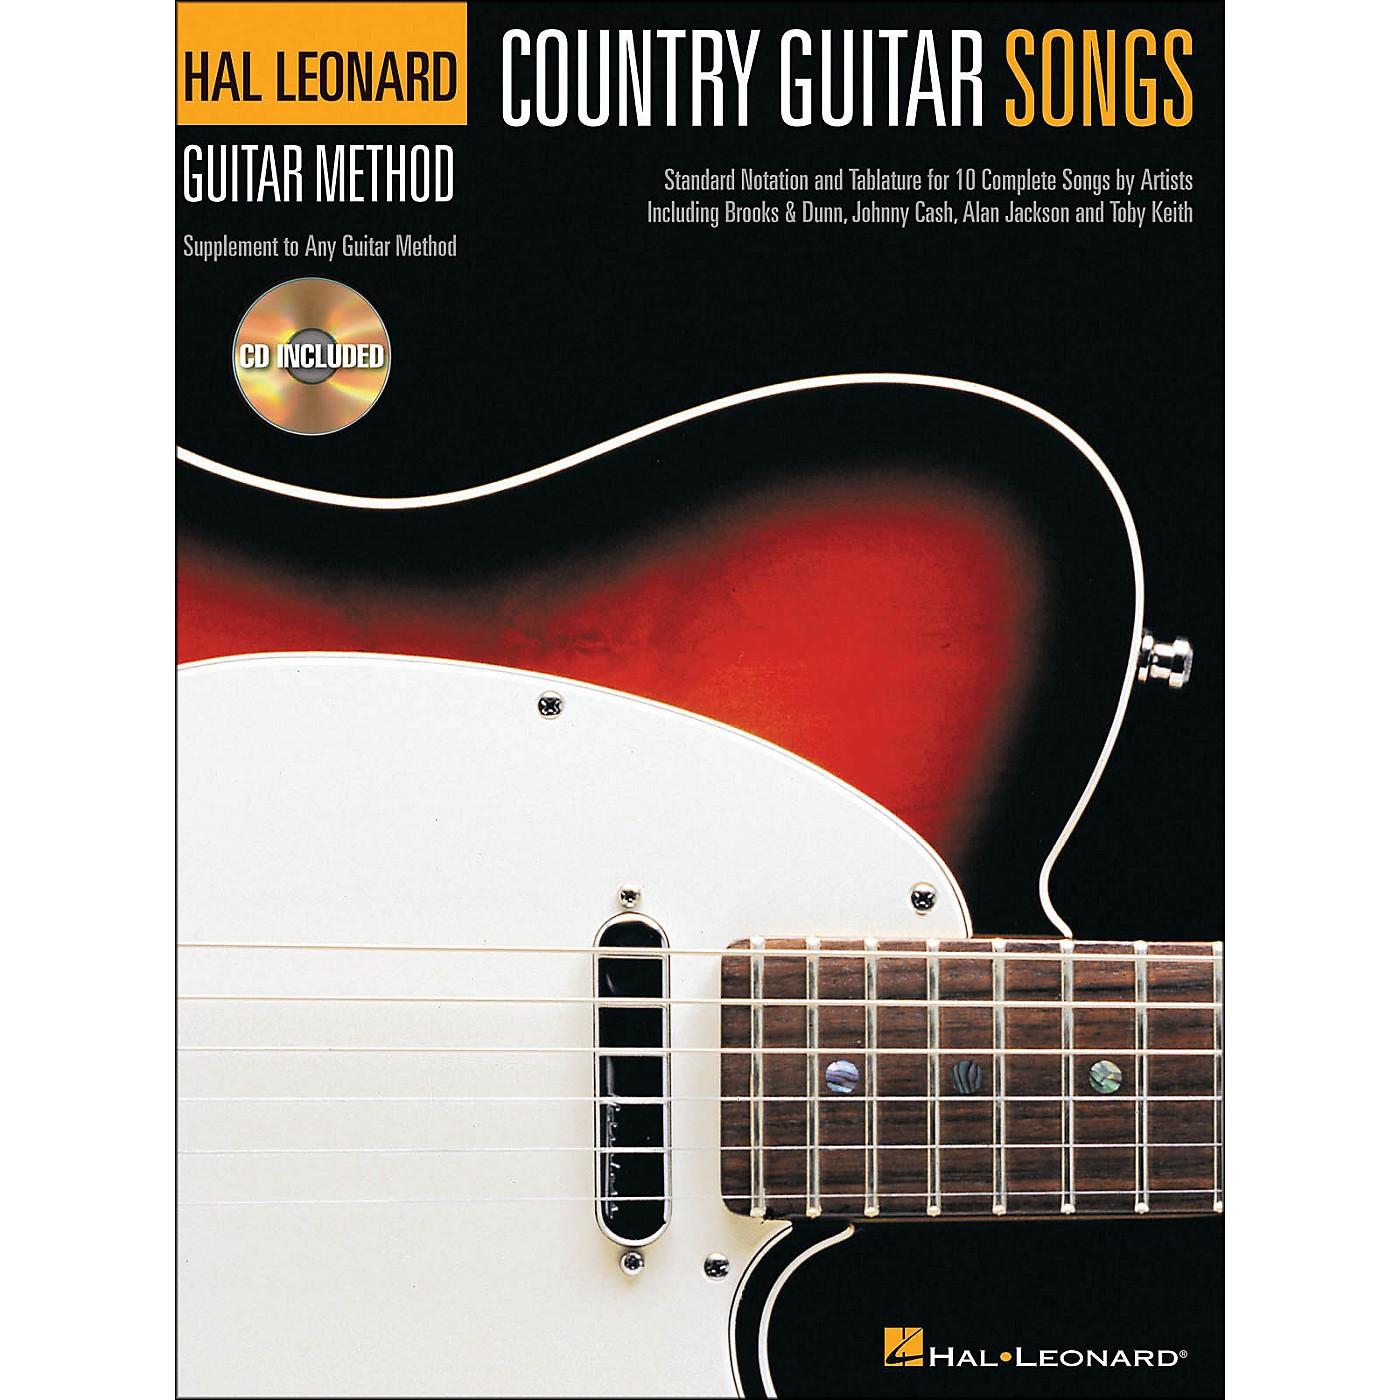 Hal Leonard Country Guitar Songs - Hal Leonard Guitar Method Supplement (Book/CD) thumbnail